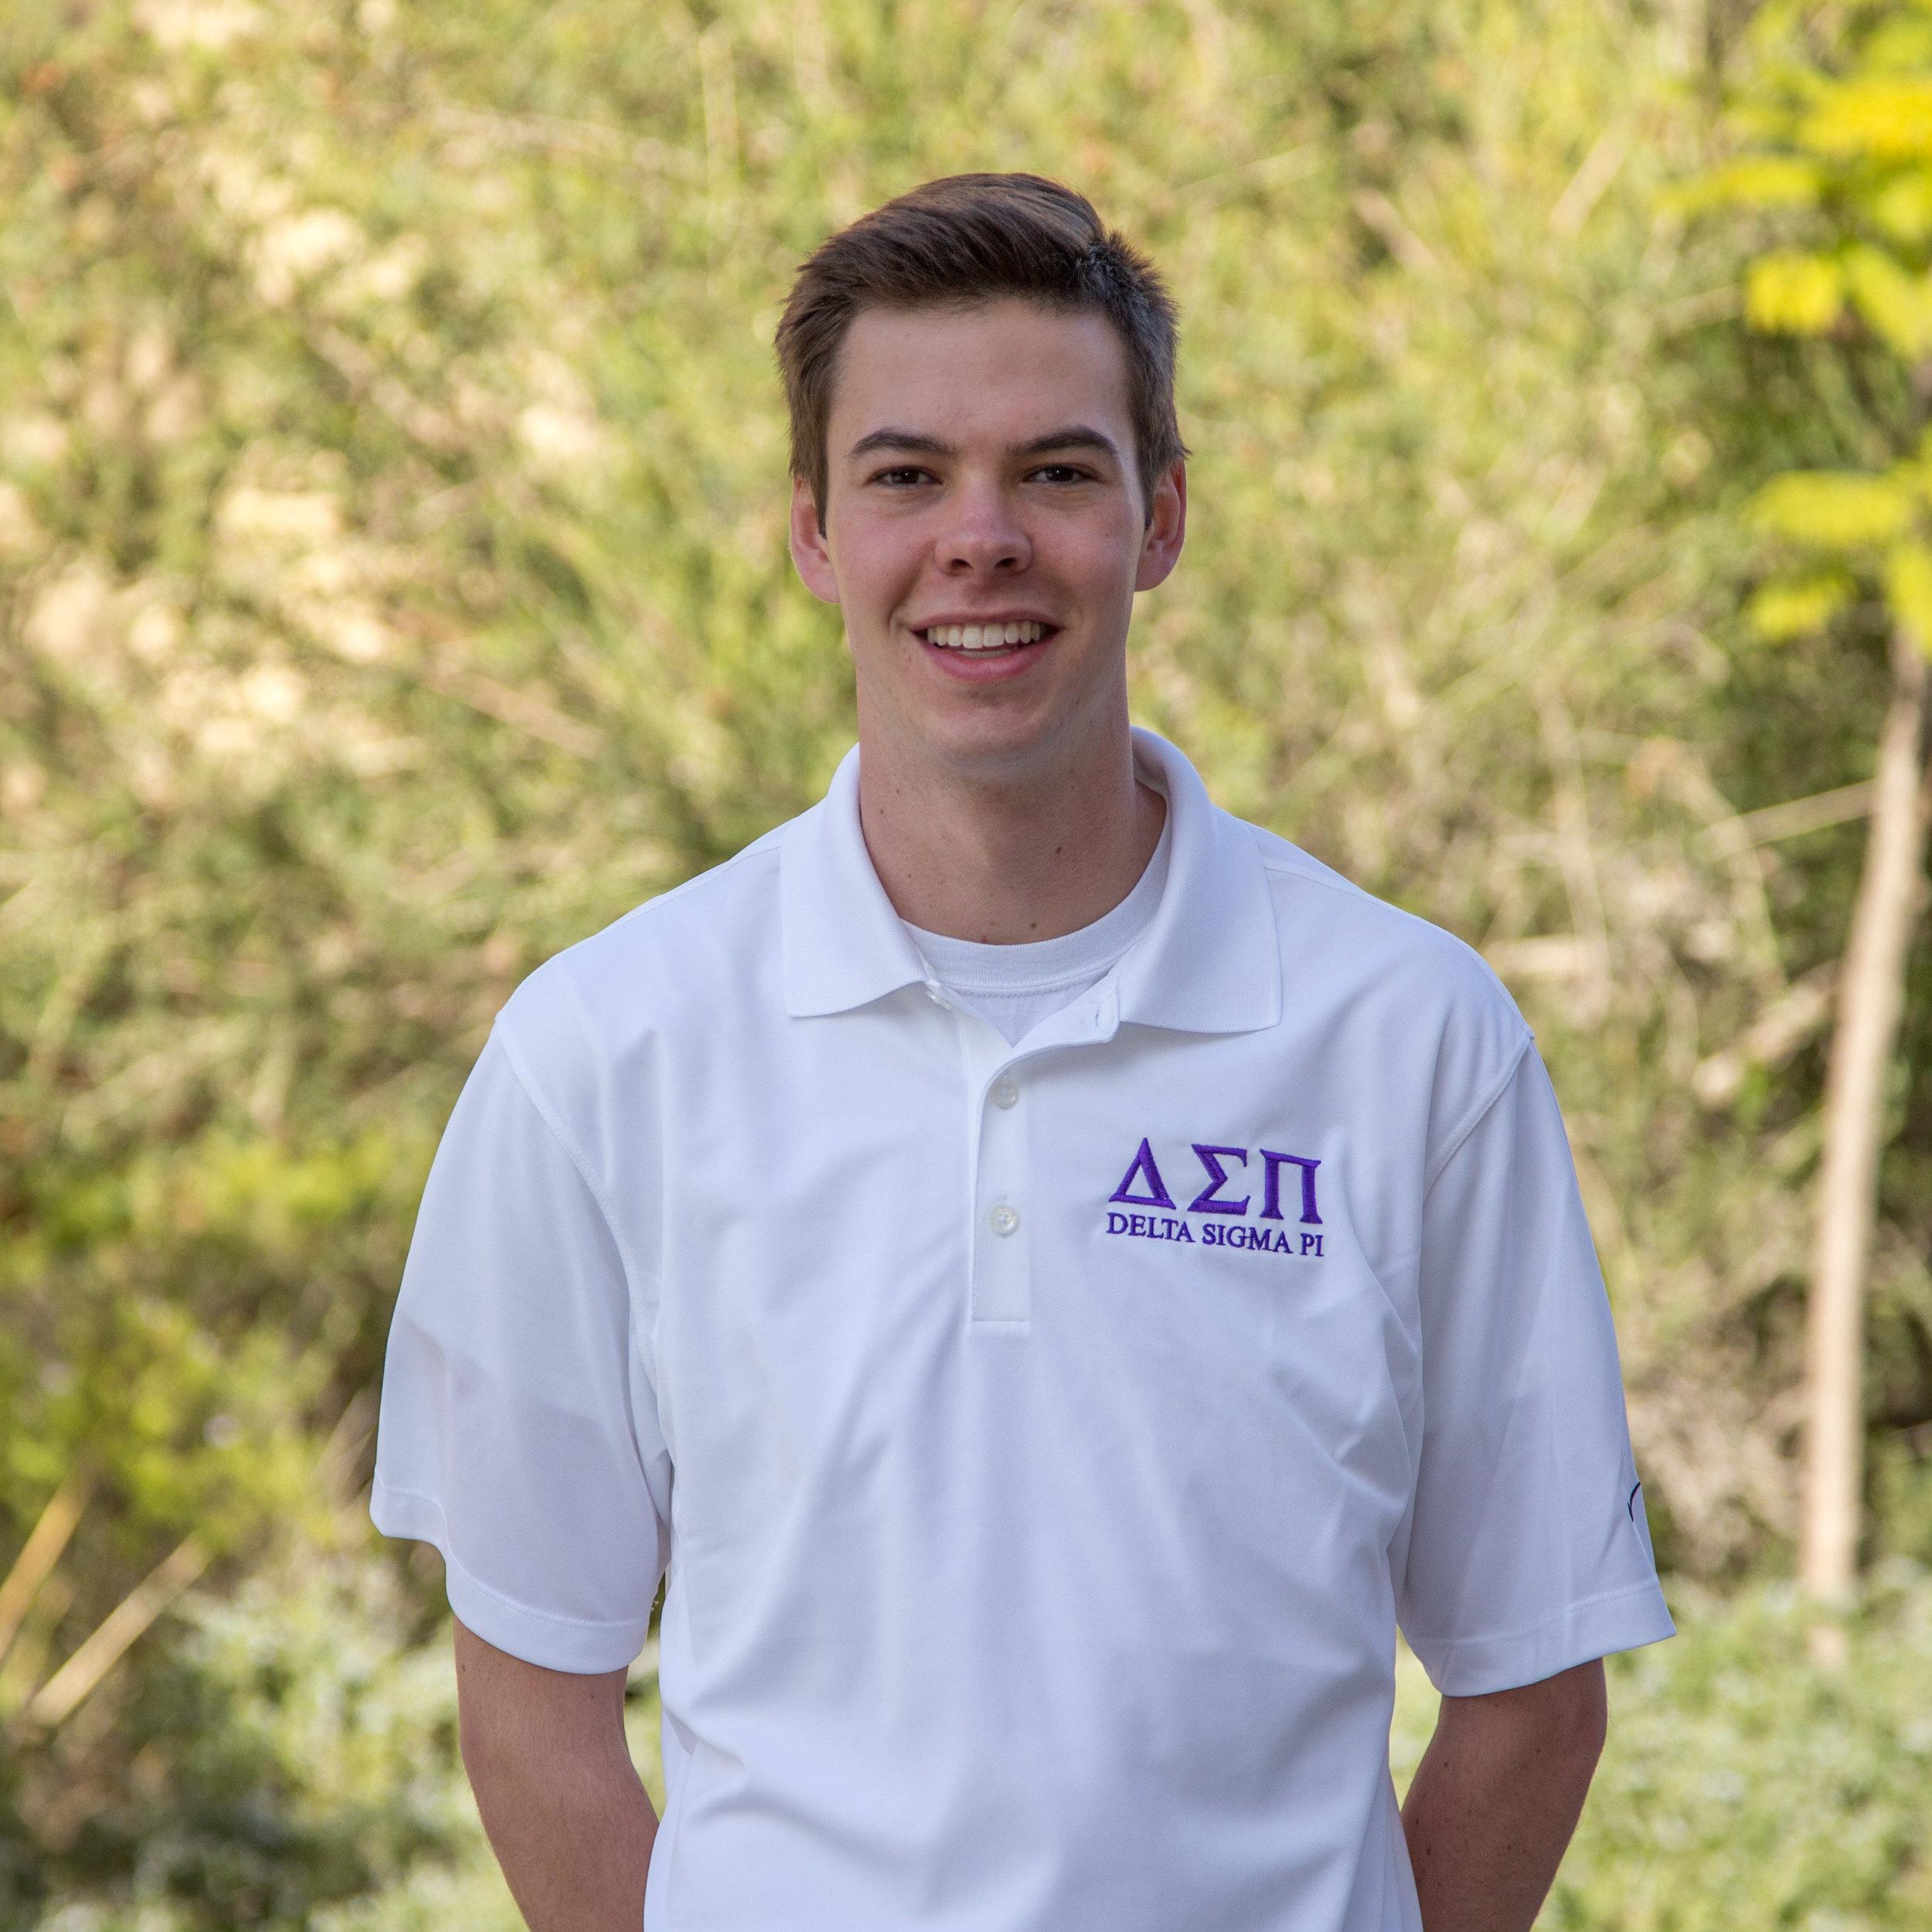 Erik Hiseler - Vice President of Chapter Operations